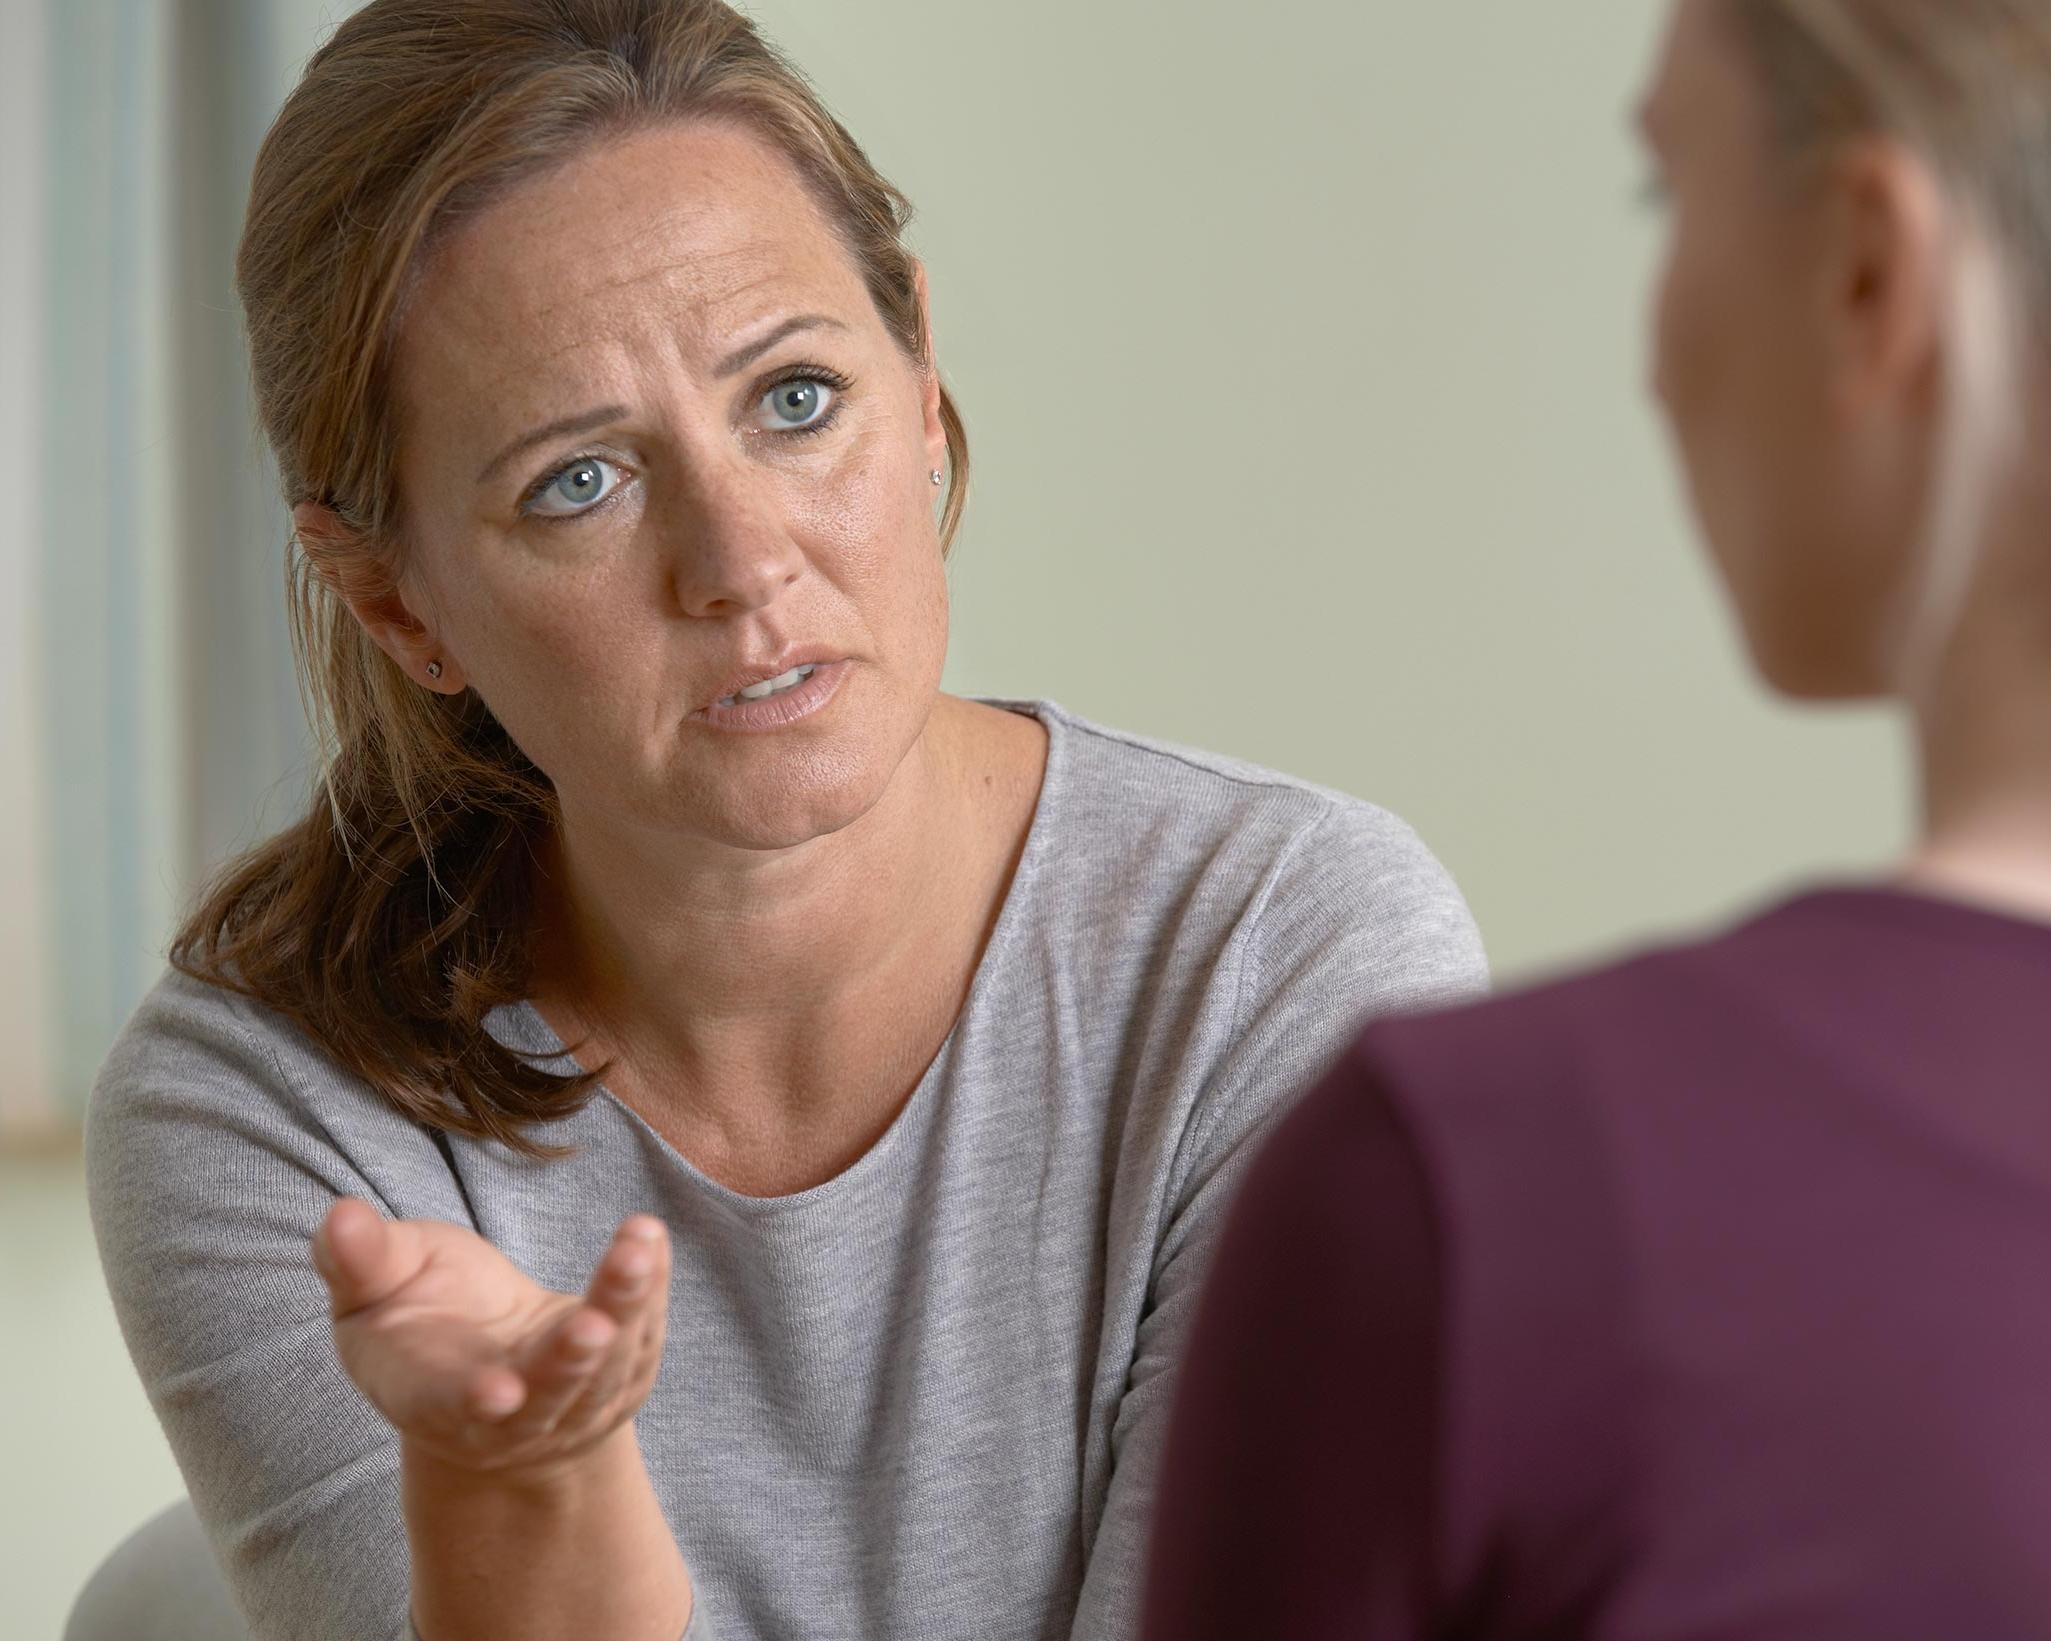 woman-counselling-2.jpg